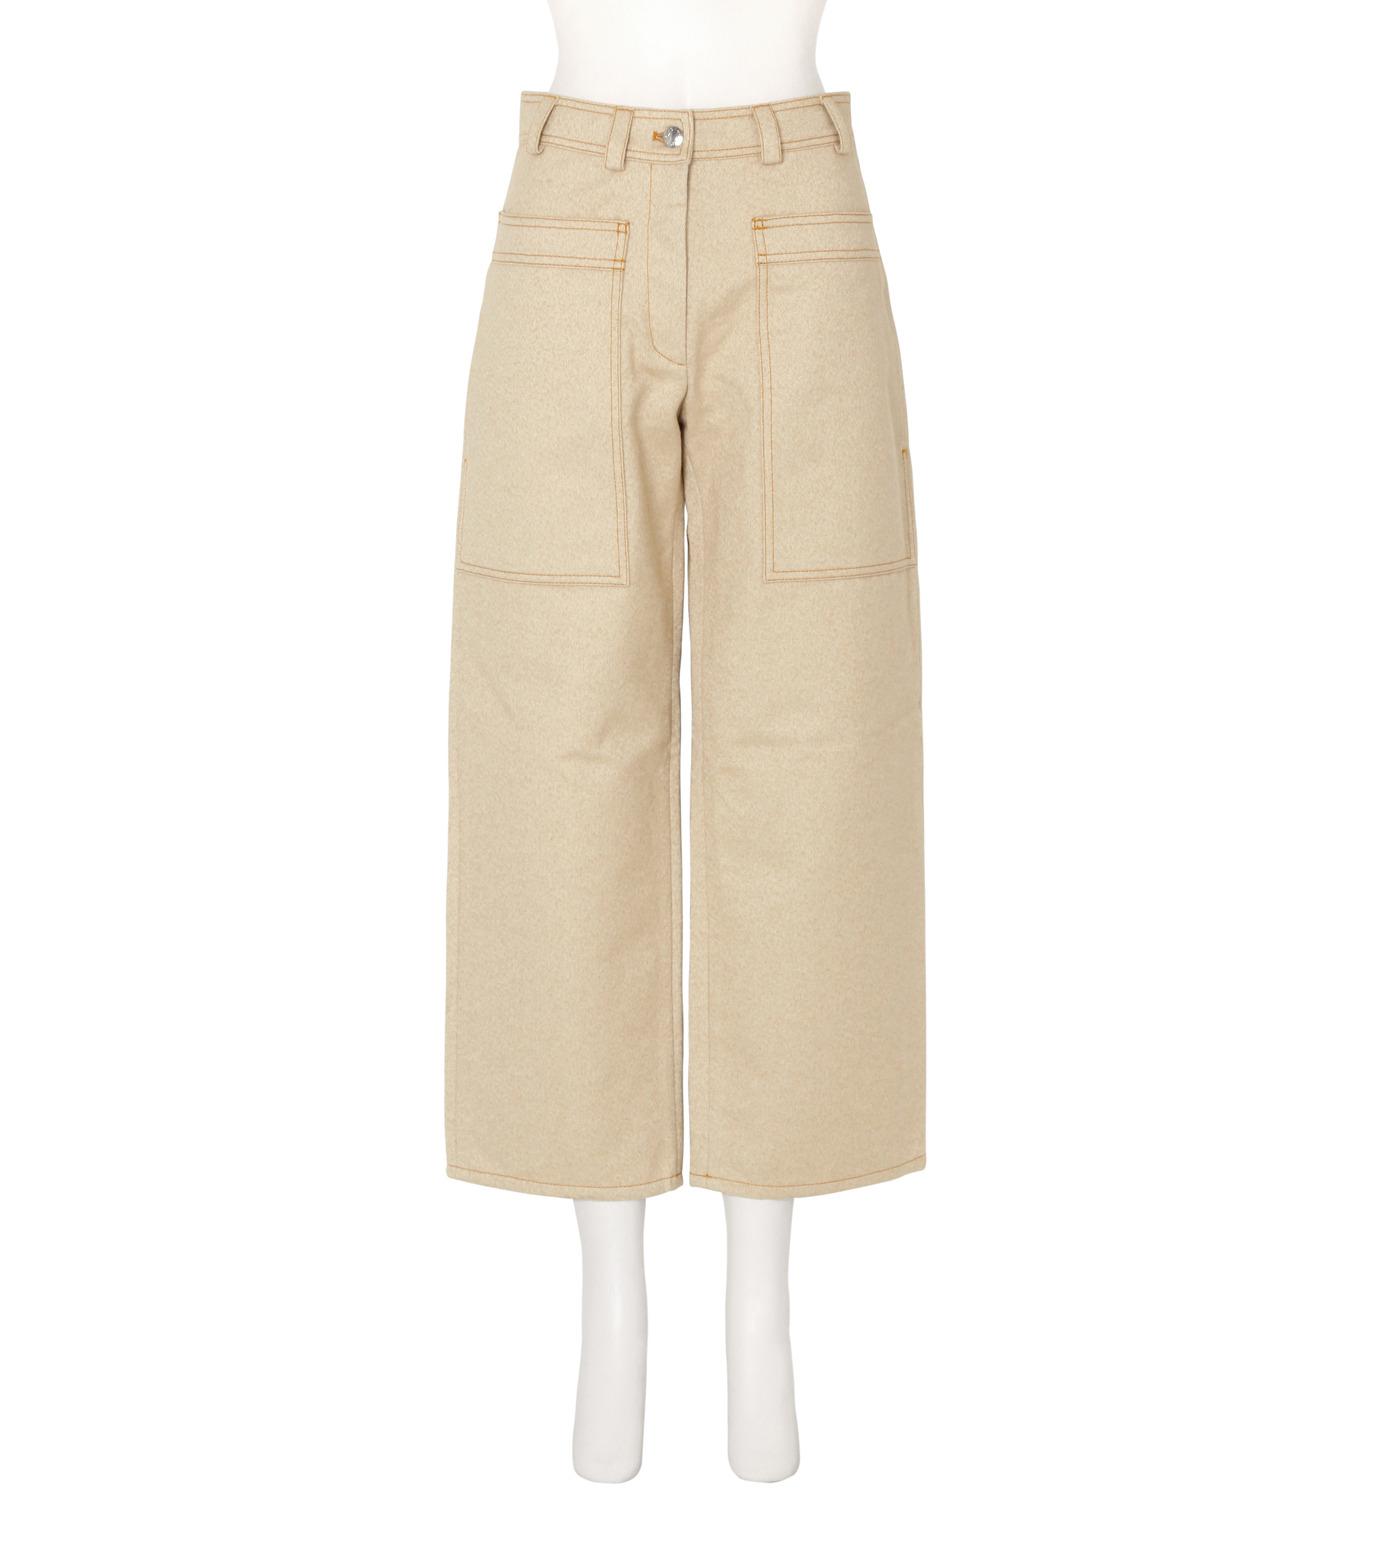 ACNE STUDIOS(アクネ ストゥディオズ)のCargo Pkt Cropped Wide Pants-LIGHT BEIGE(パンツ/pants)-10B163-51 拡大詳細画像1